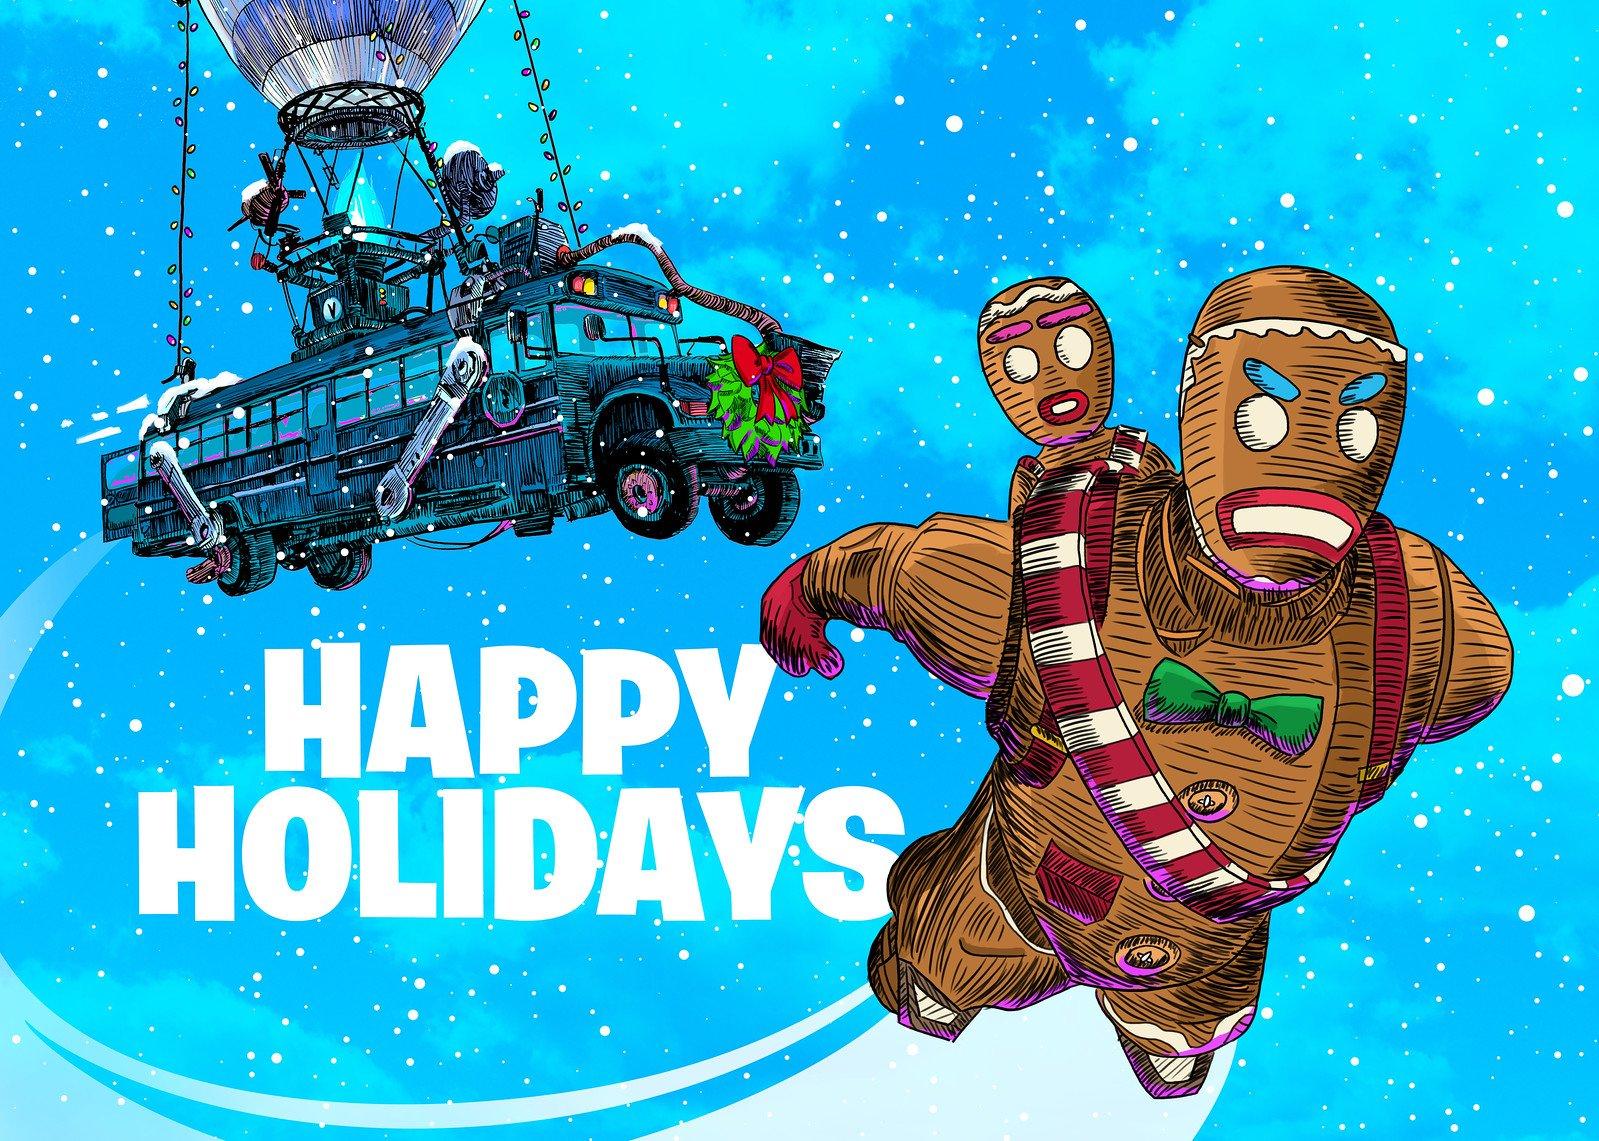 Fortnite Happy Holidays Wallpaper